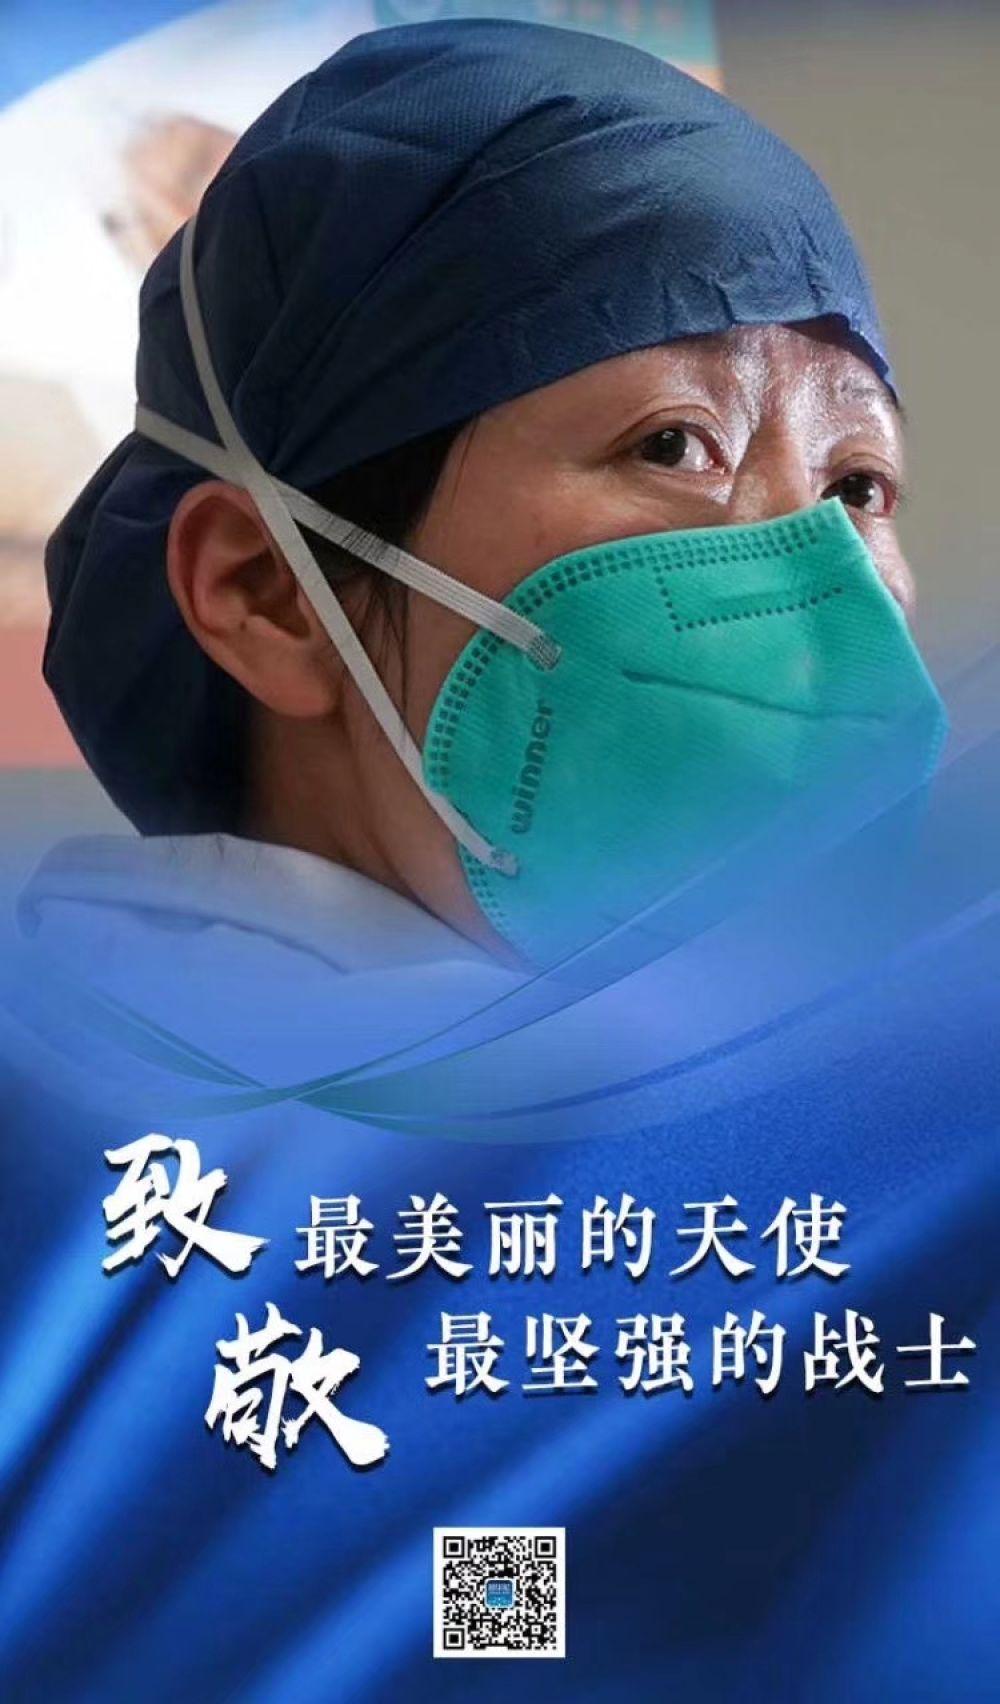 http://www.mogeblog.com/kexuejishu/1650489.html